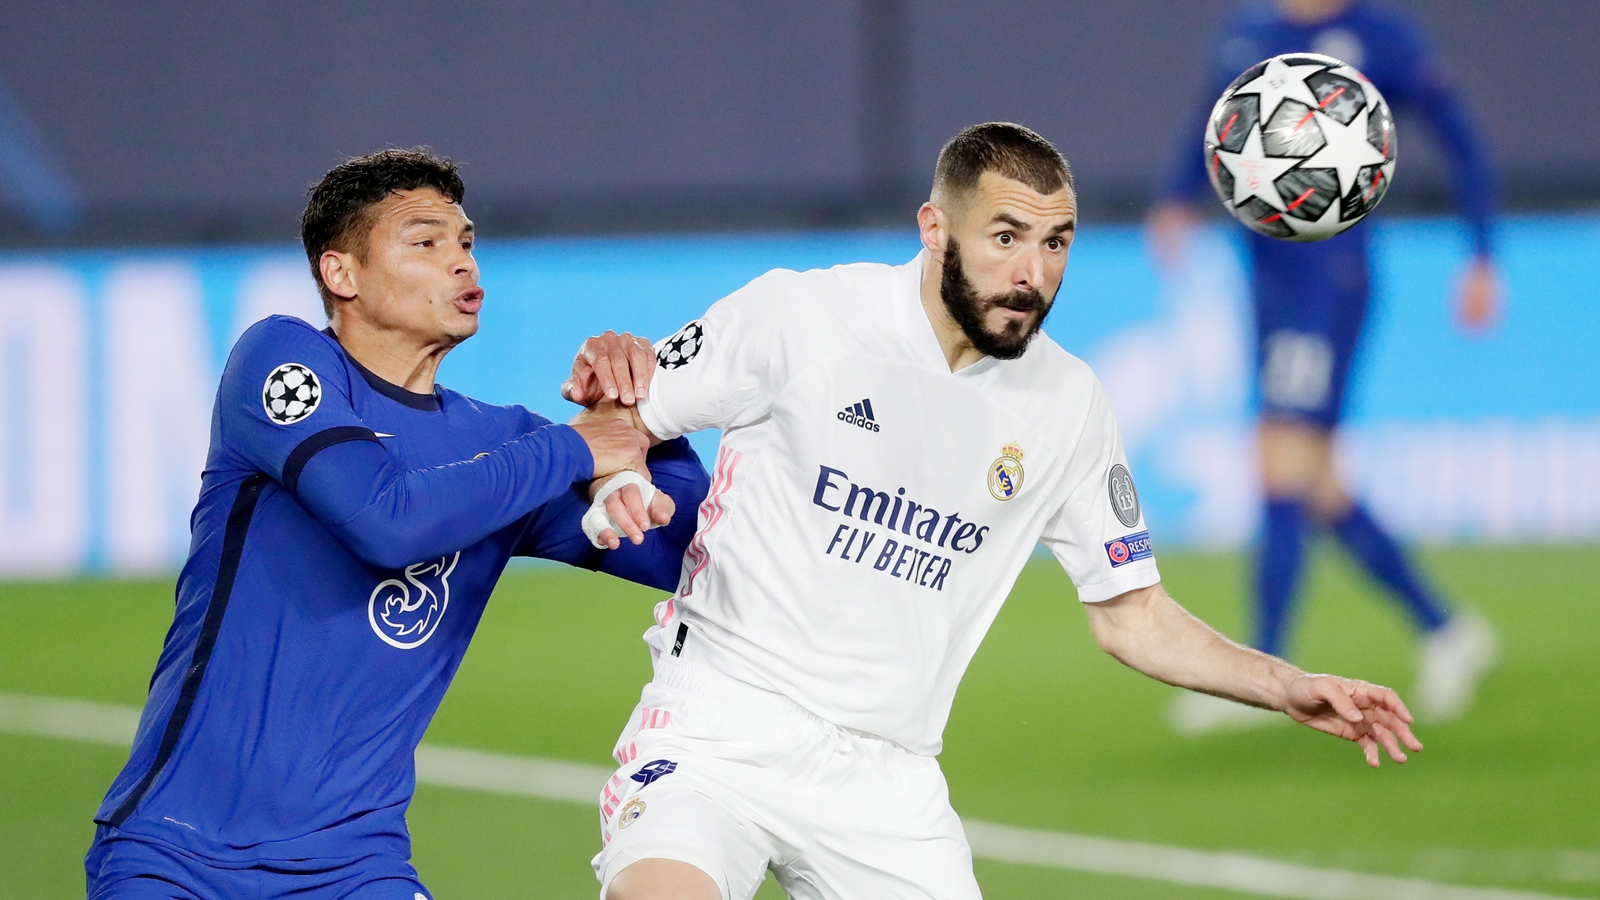 Champions League: Real Madrid 1-1 Chelsea - recap